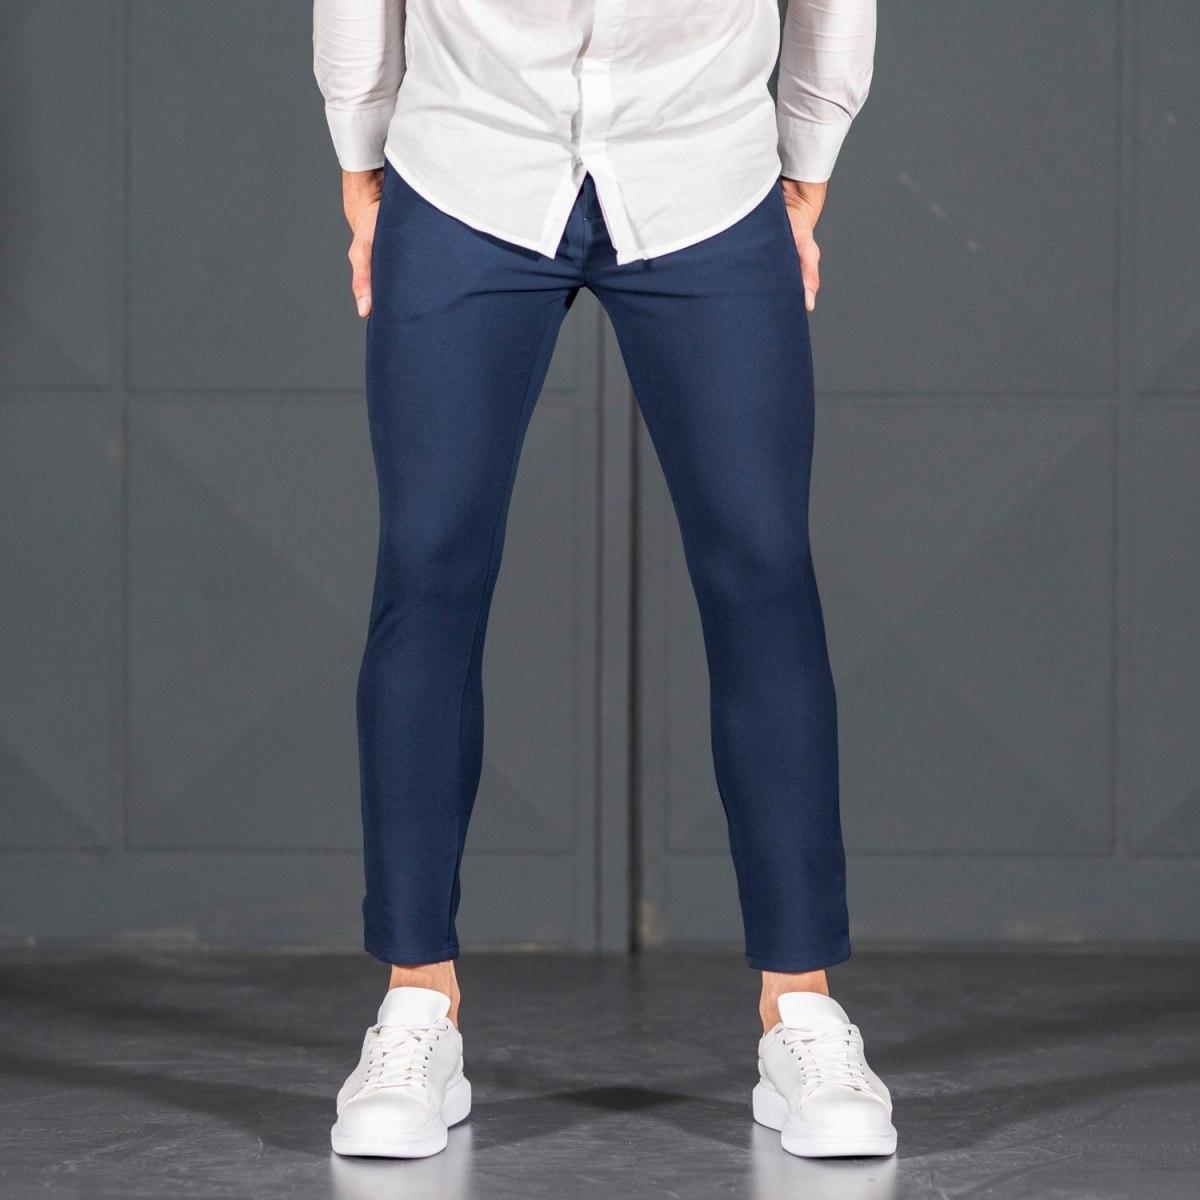 Navy Blue Slim-Fit Trousers Mv Premium Brand - 1